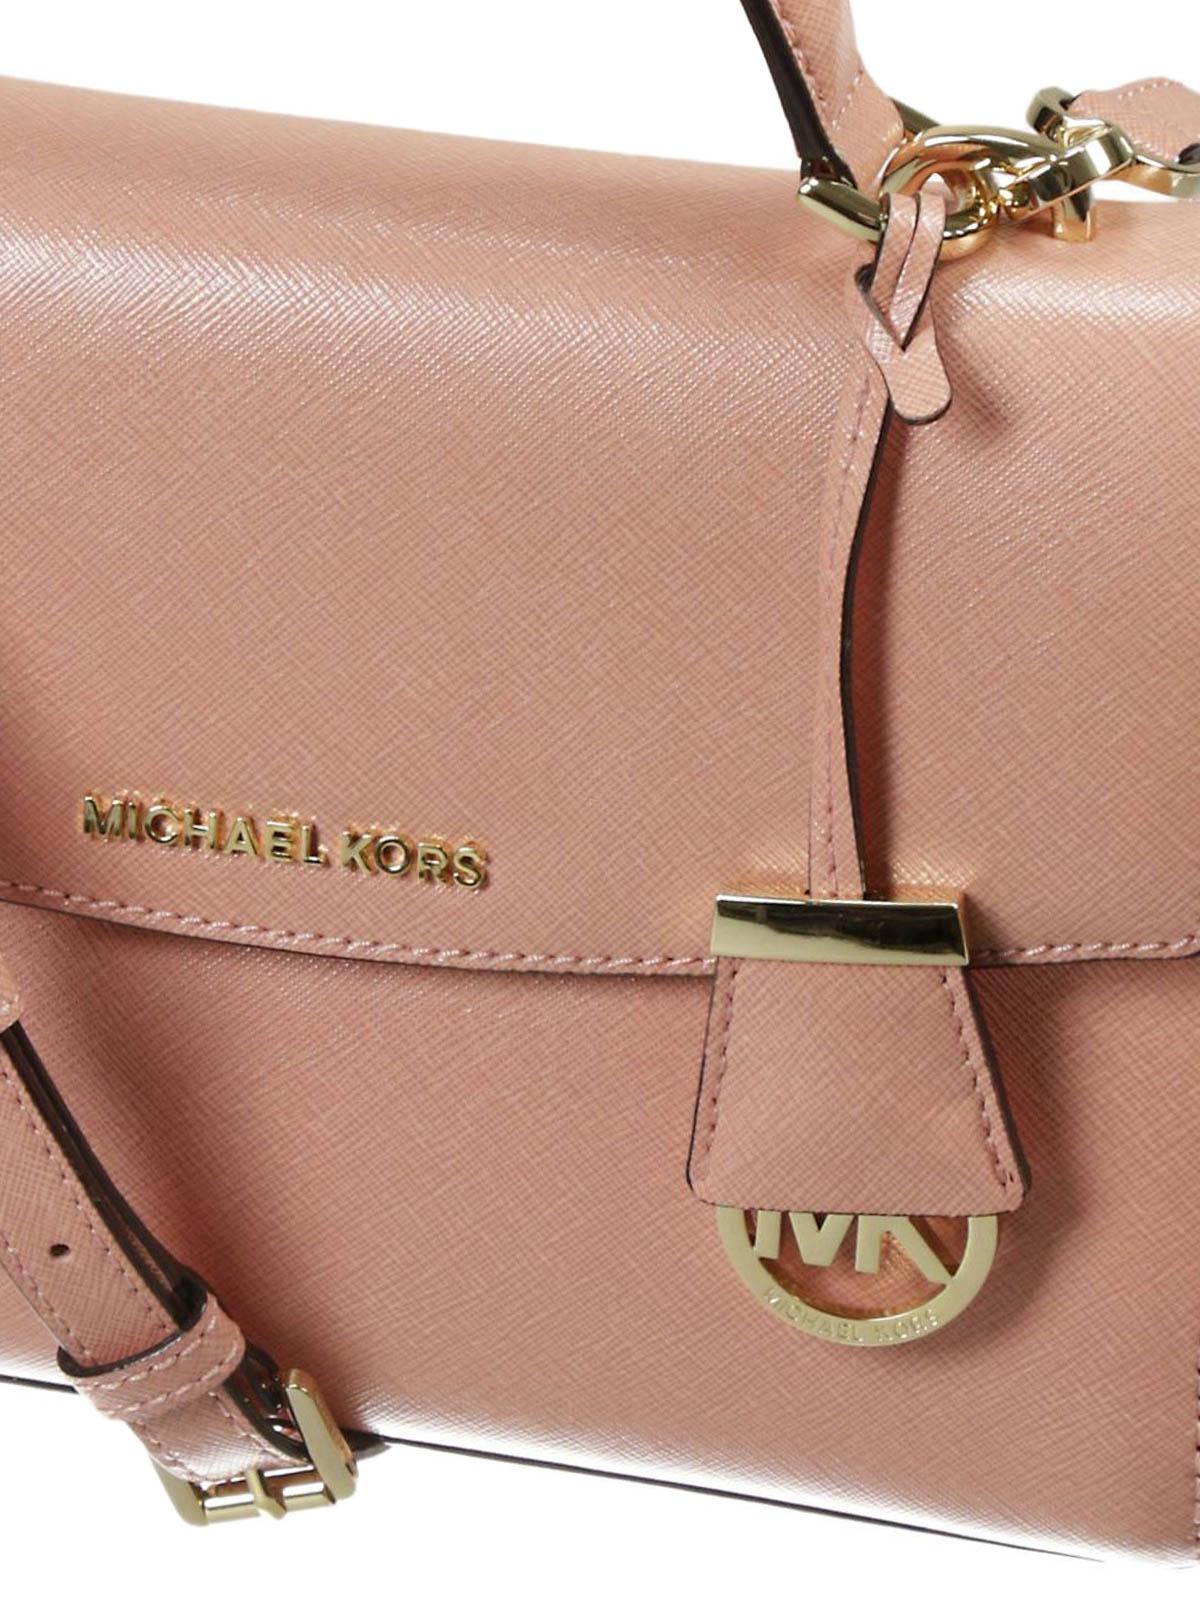 424a8b2c765cd iKRIX MICHAEL KORS  cross body bags - Ava small saffiano satchel